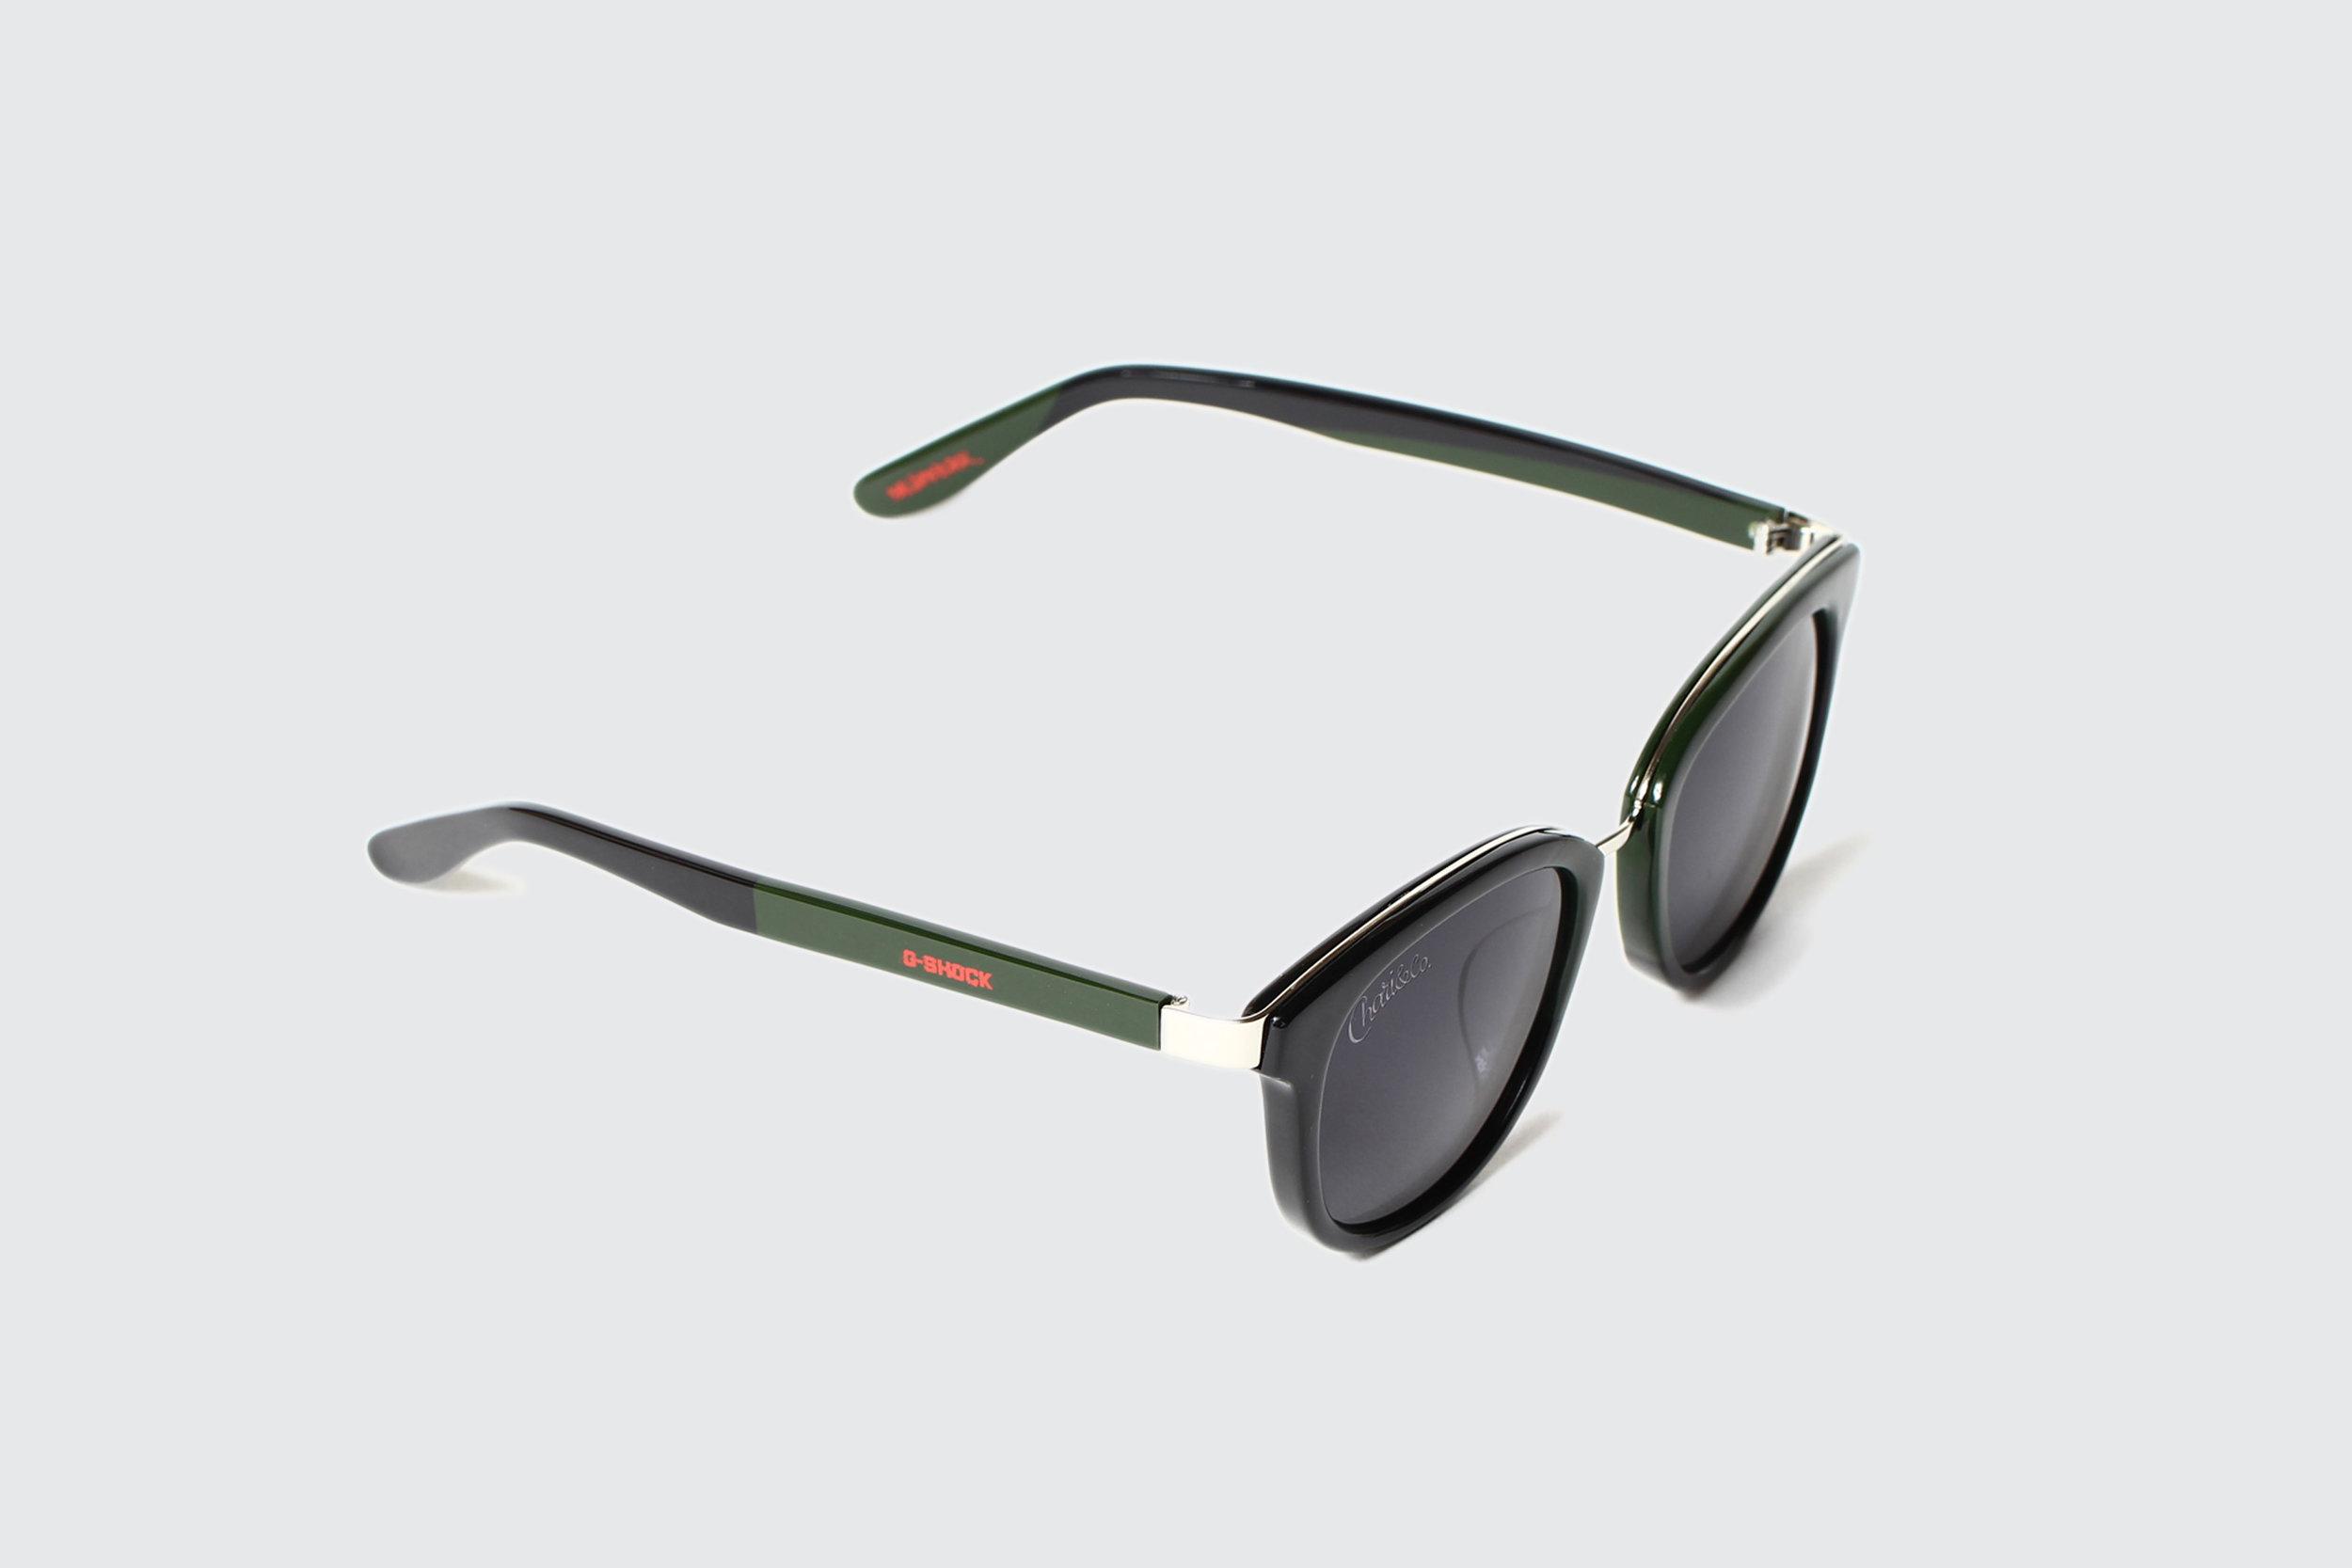 G-SHOCK ITEMS 2017_eyewear.jpg